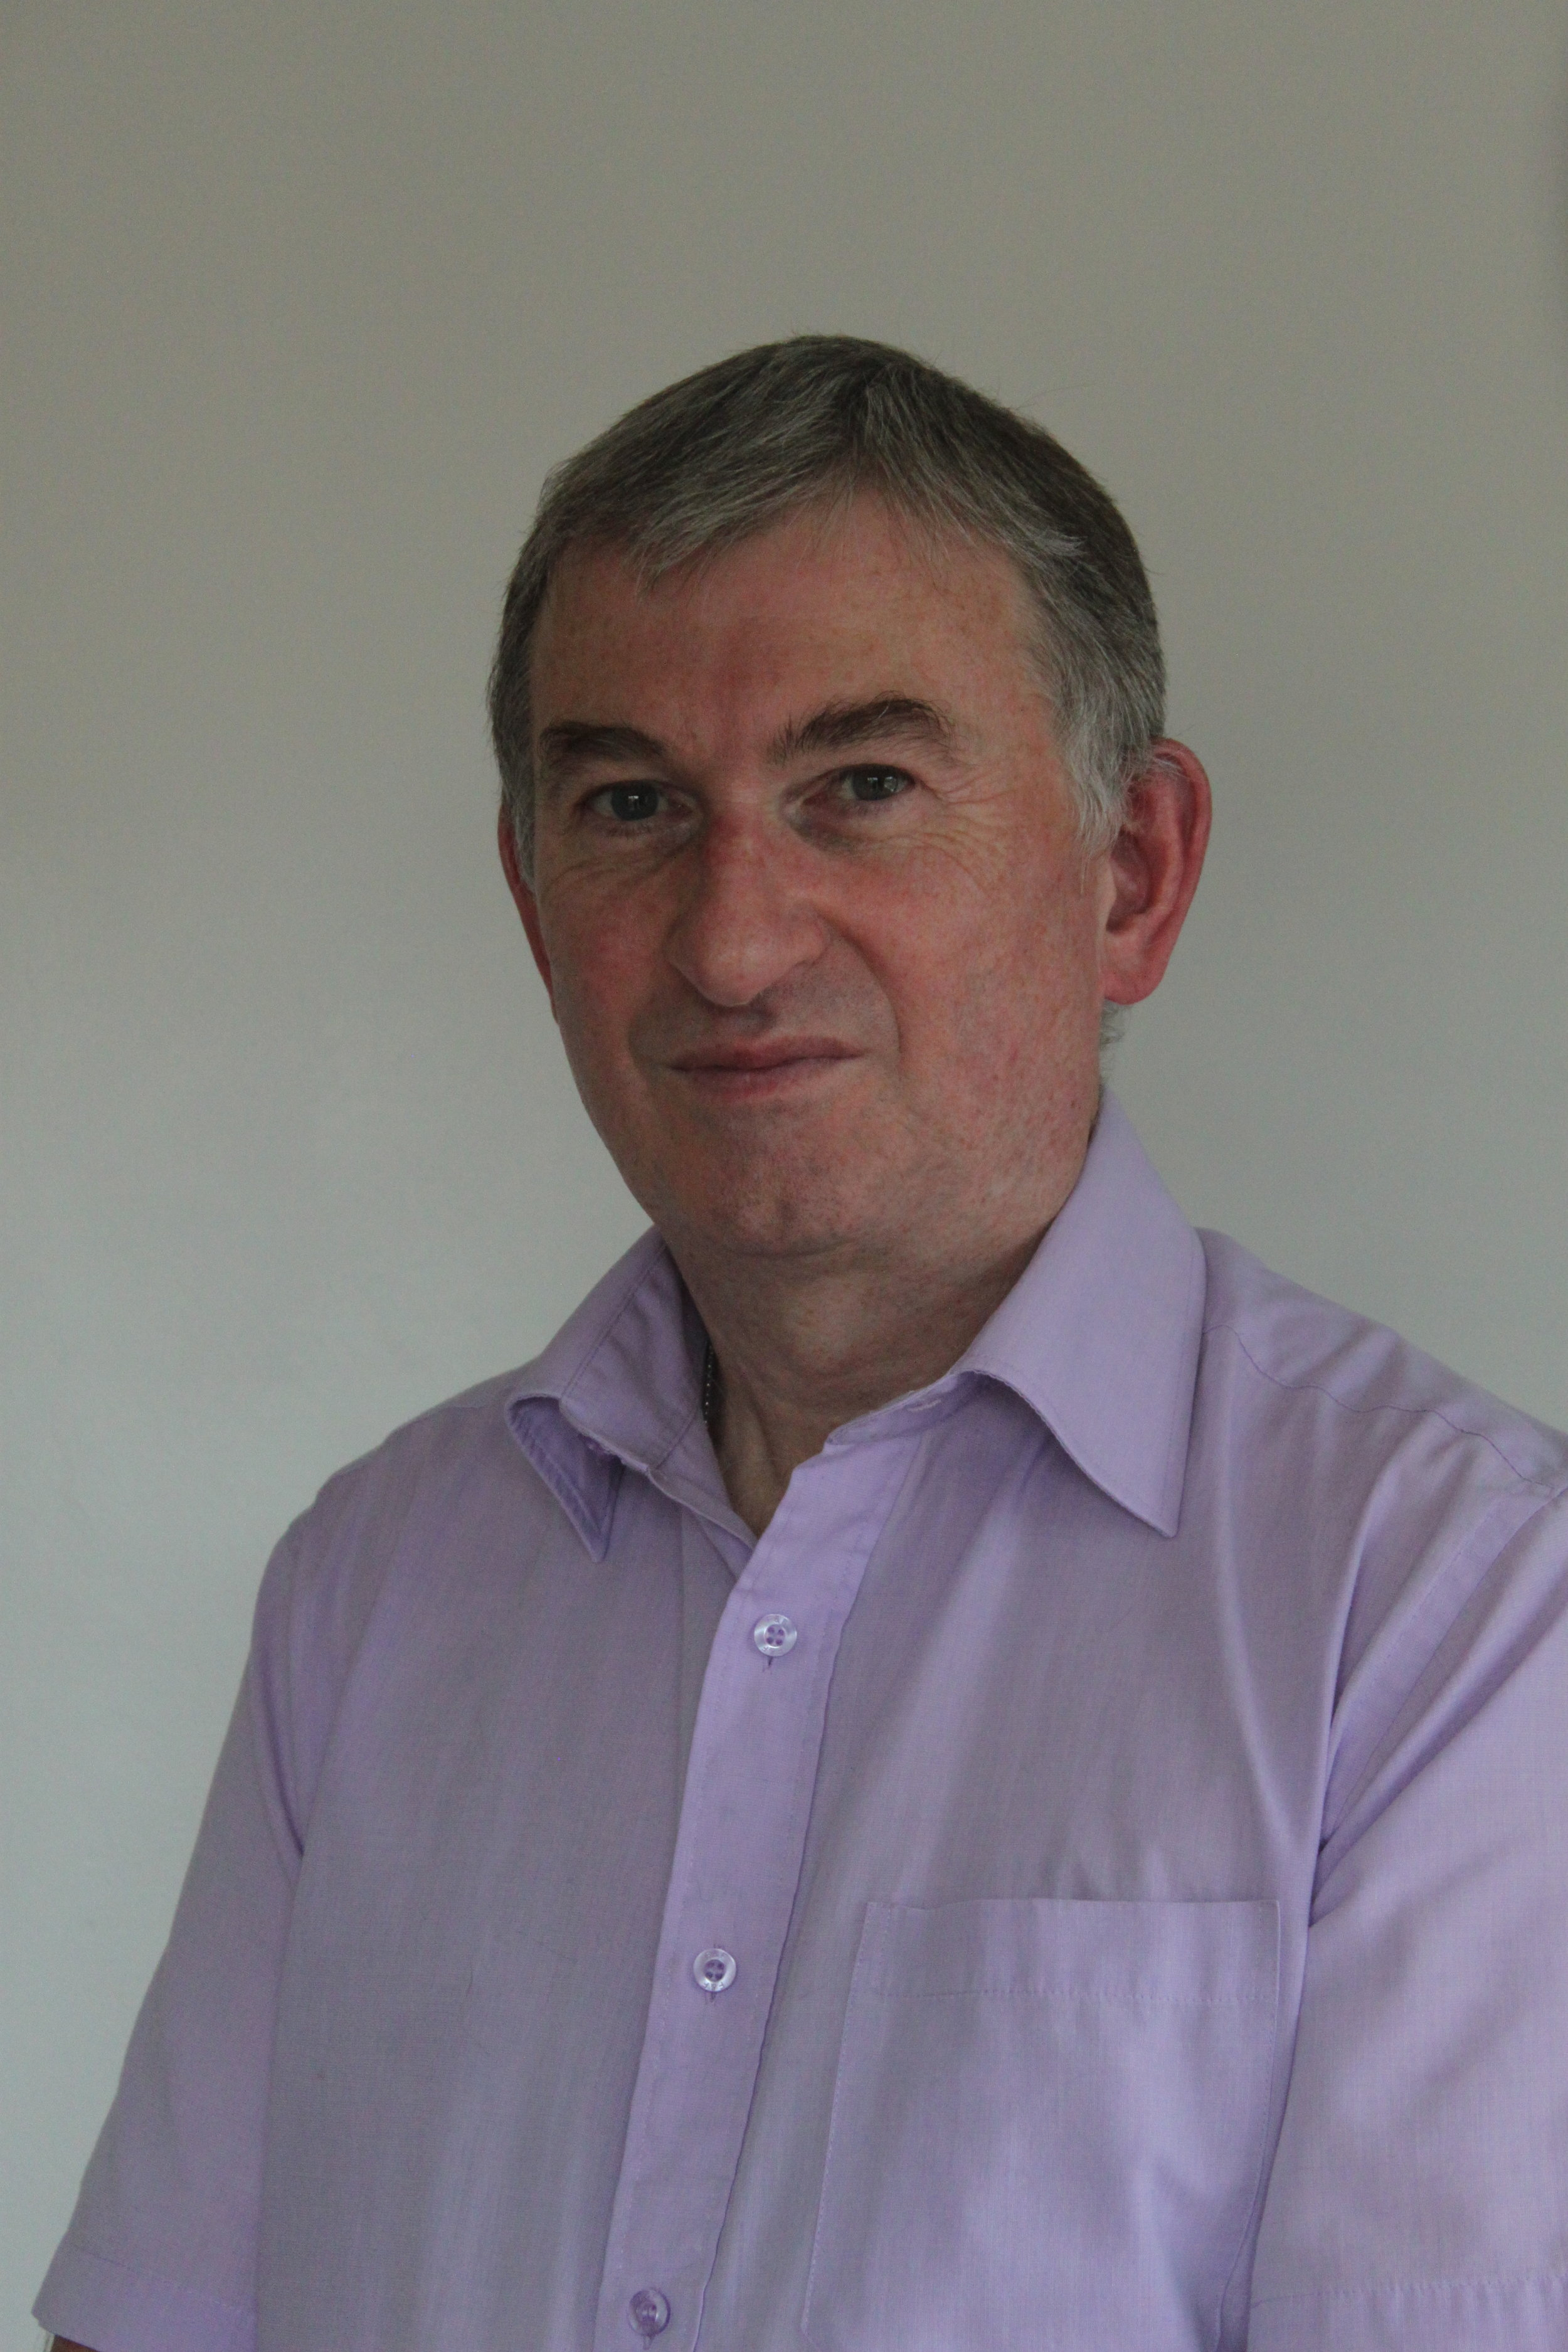 Chris Moorhouse